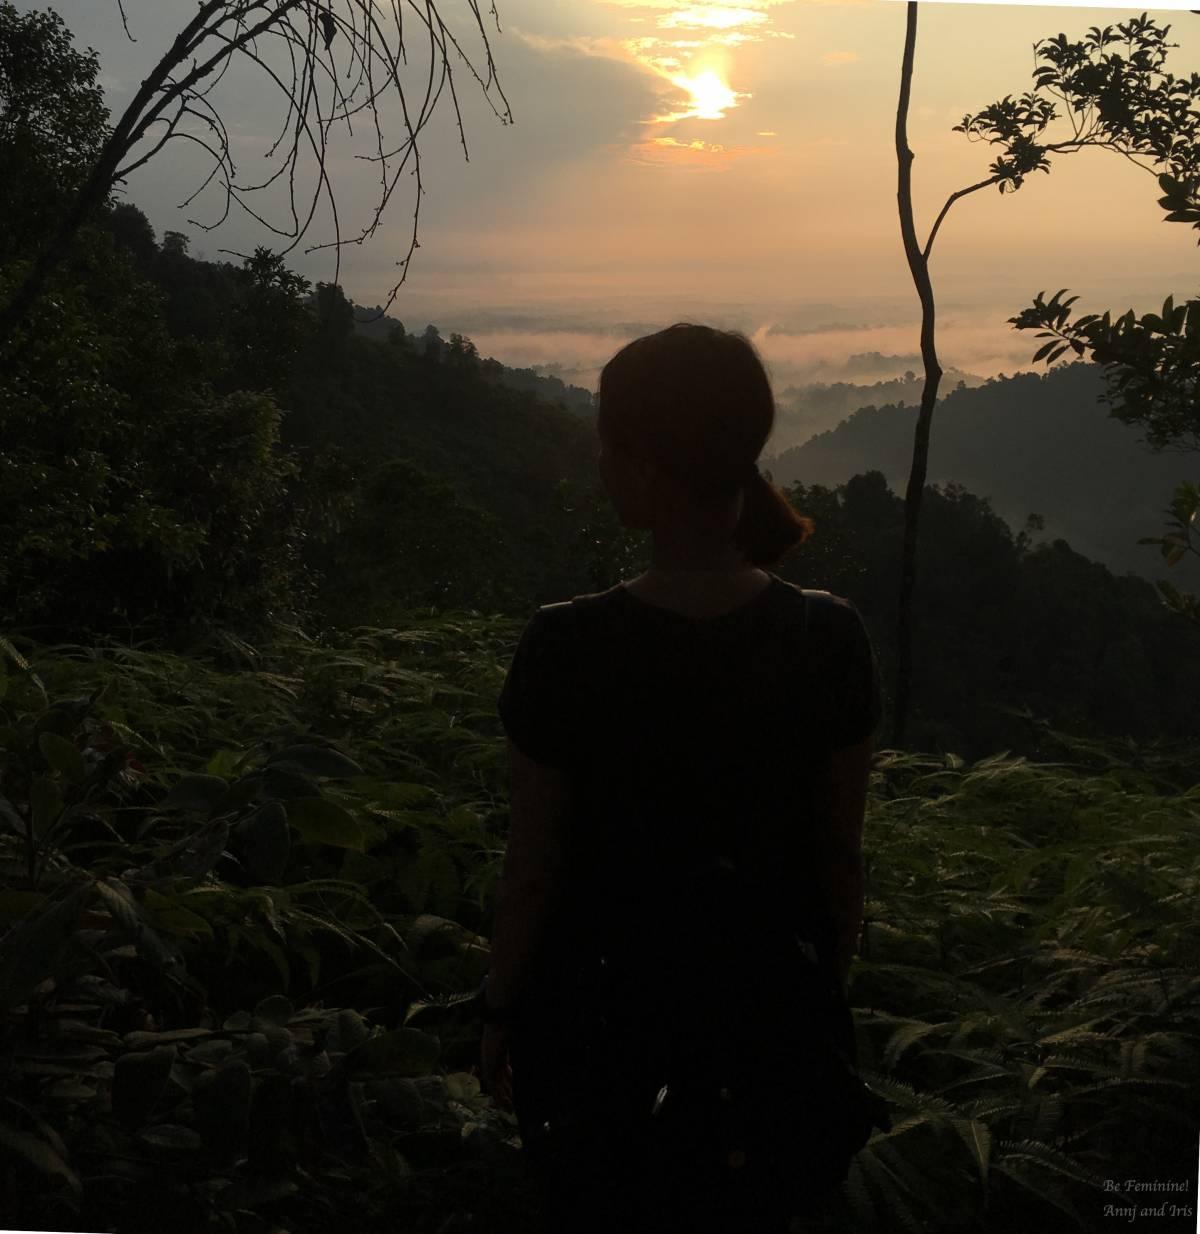 My Lover Was A Logger : 馬來西亞旅行 係邊度唱馬幣最抵最方便?買電話卡買邊間最好?當地用咩插頭?點ca be feminine